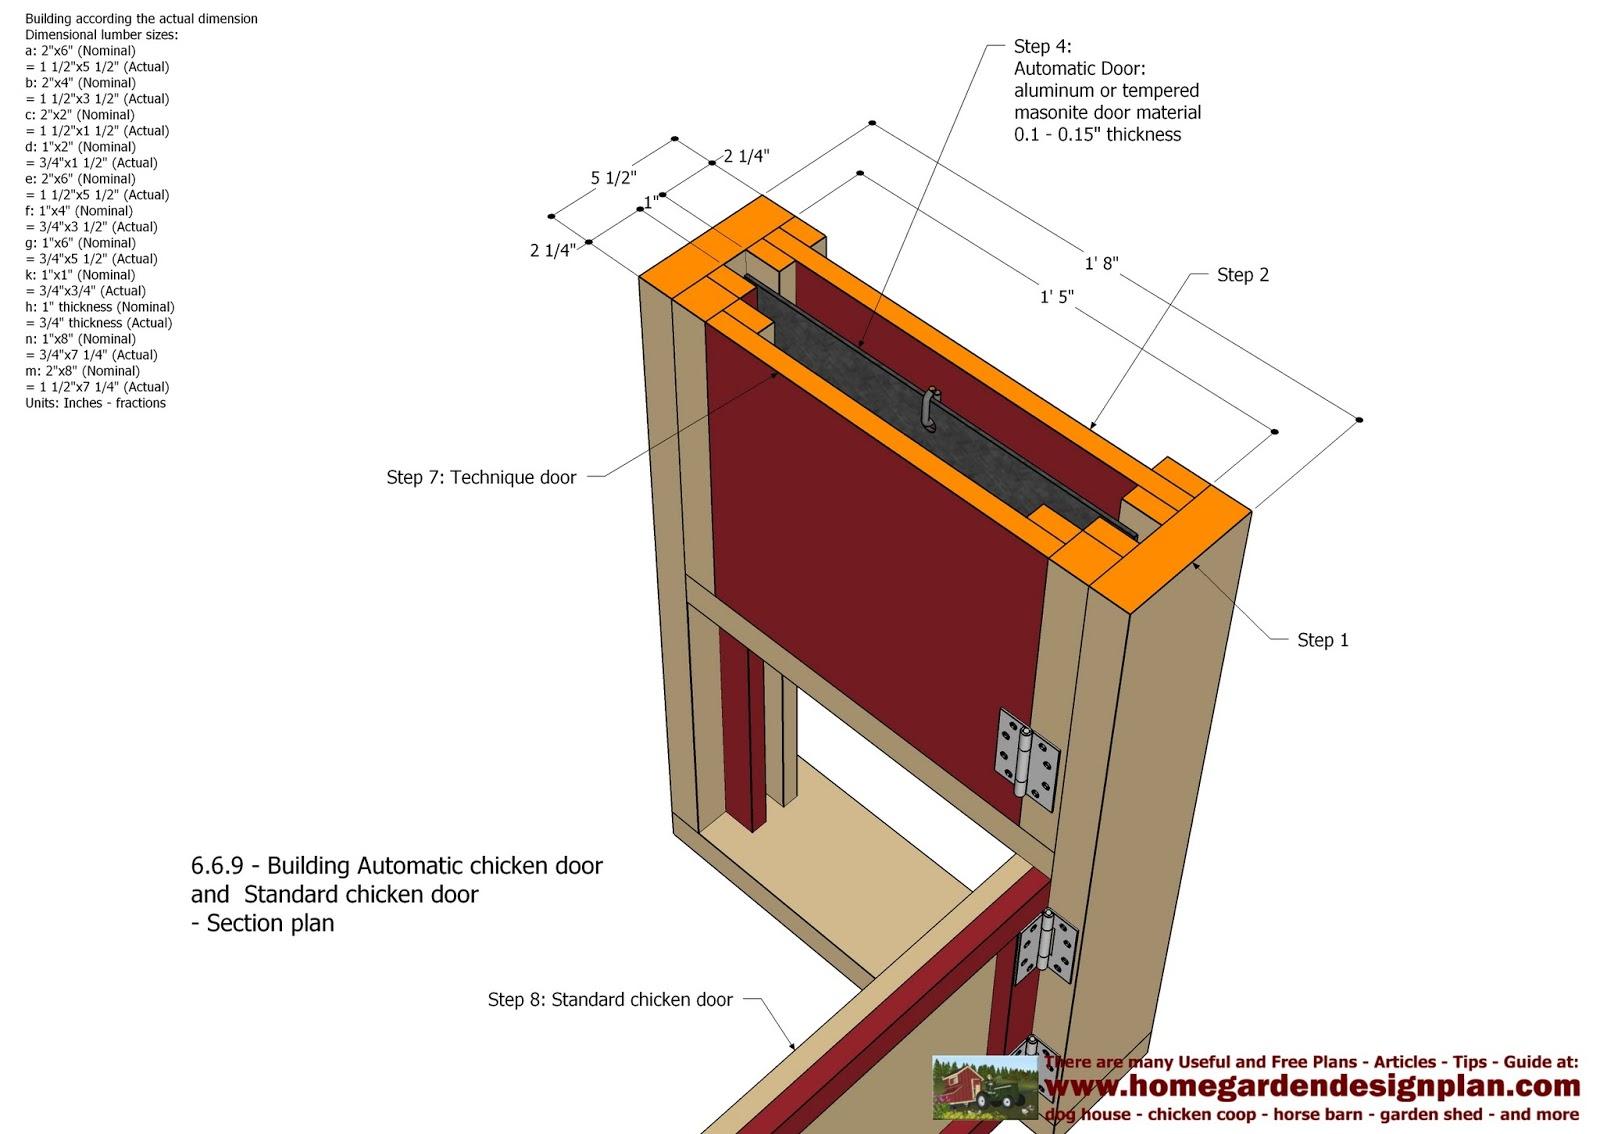 how to draw doors on a floor plan